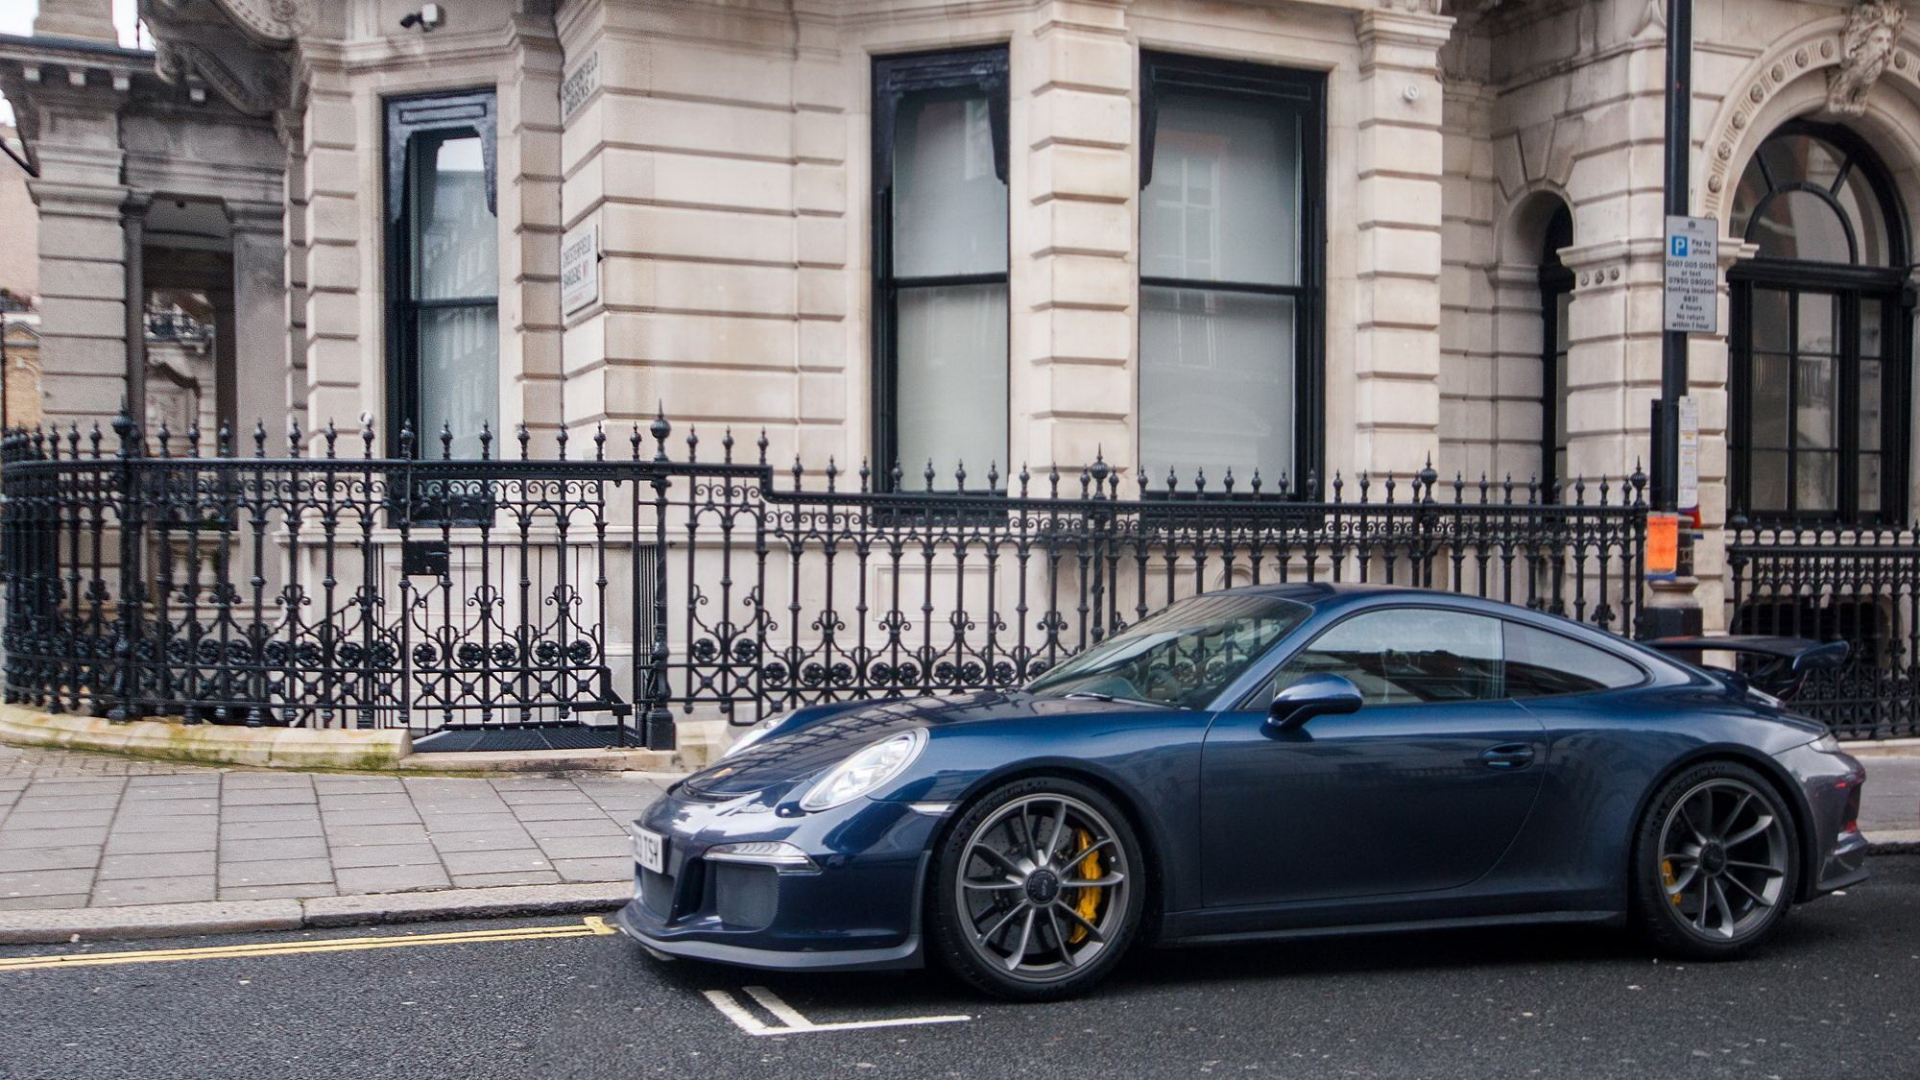 Dark Blue Metallic Car Paint